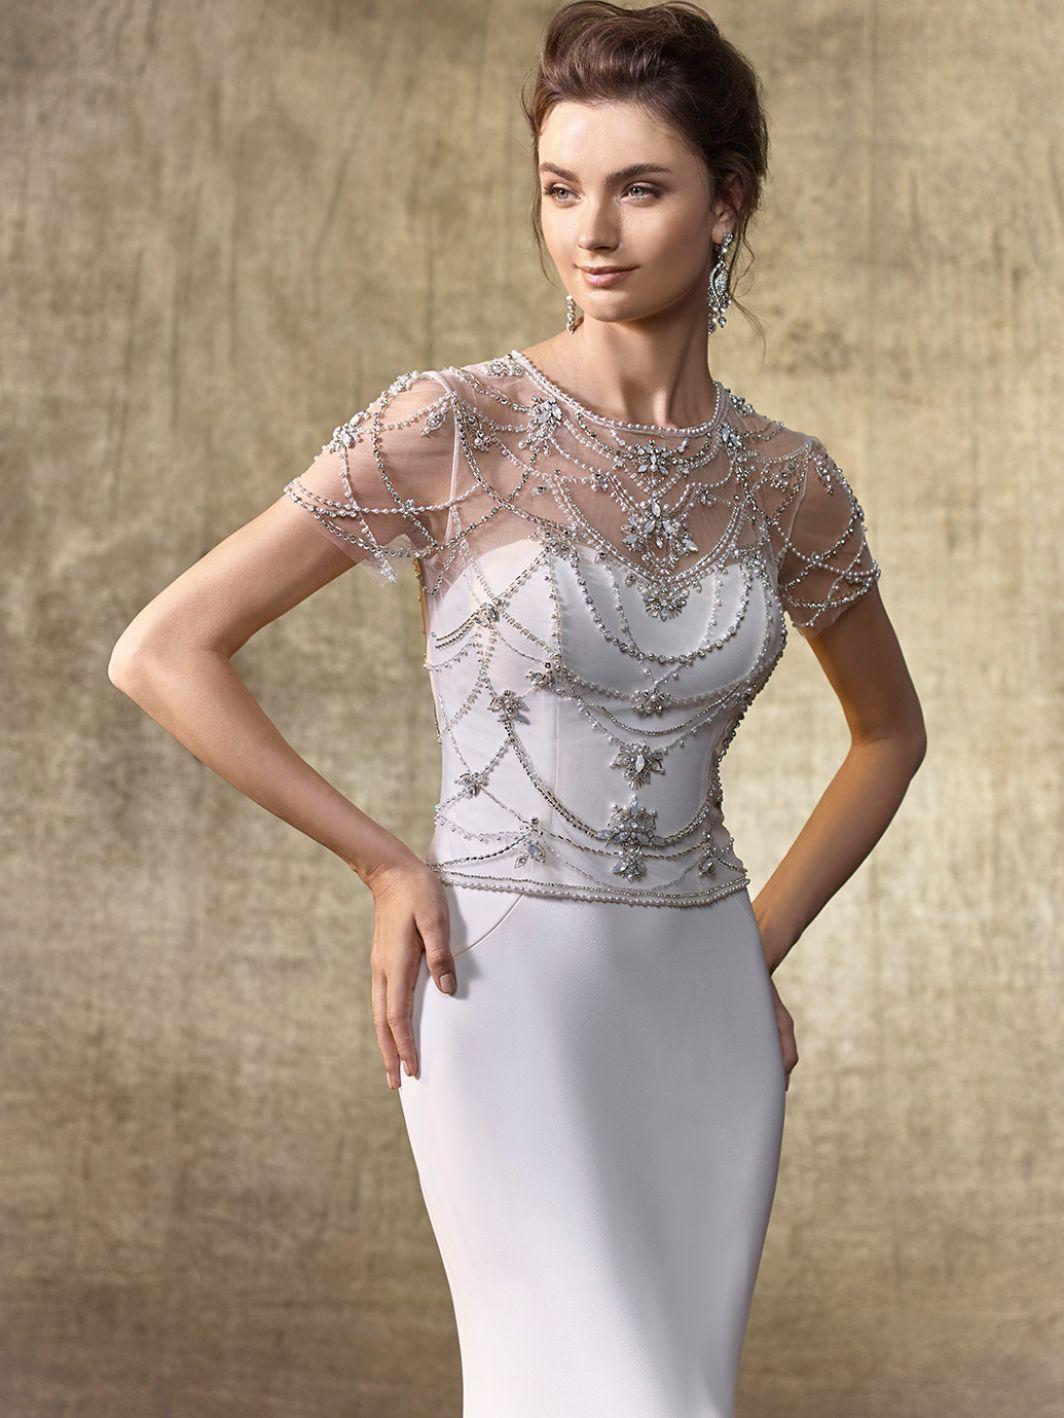 Wedding dress bodysuit   Enzoani Jacket T Front View  Hello Beautiful  Pinterest